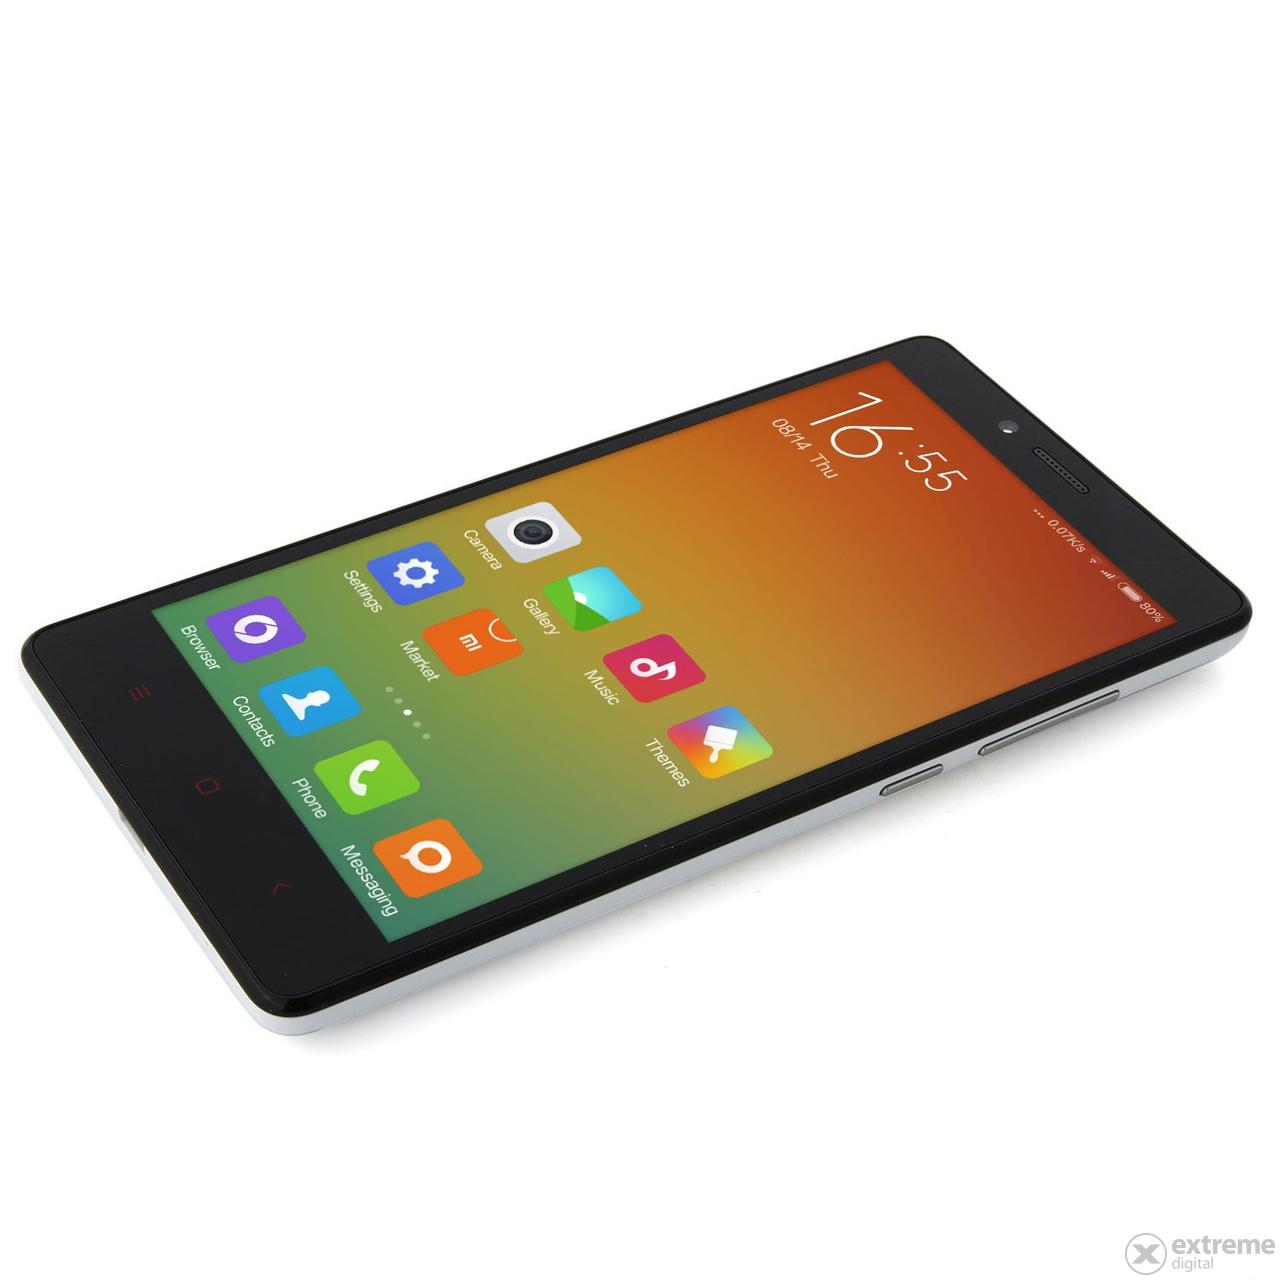 Xiaomi Redmi Note 4G Android